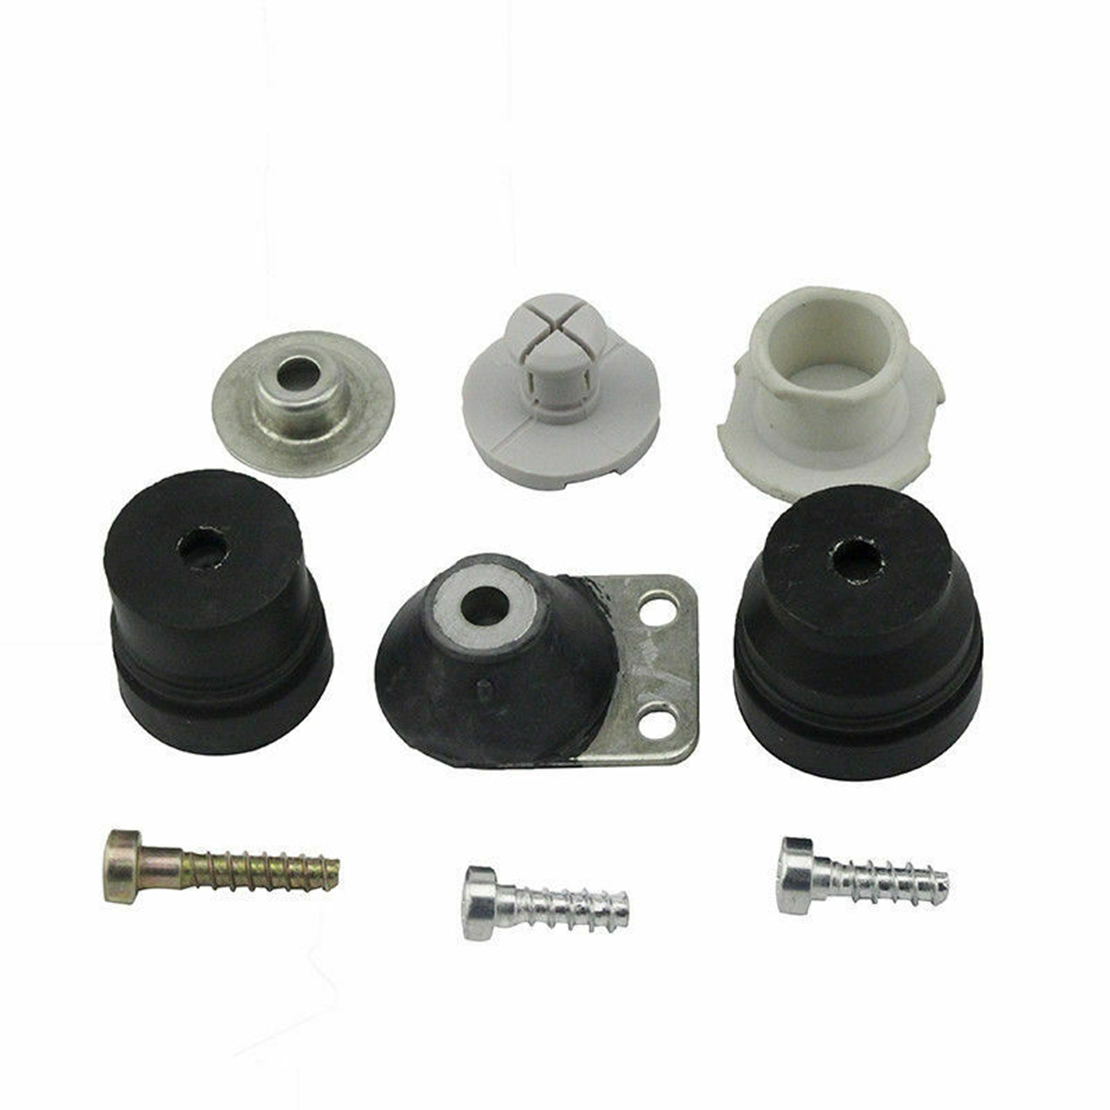 1121 790 9912 Anti-Vibration Buffer Set Screw Plug Cap Mount Kit 1121 790 9909 Fit for Stihl 026 024 MS240 MS260 Chainsaw